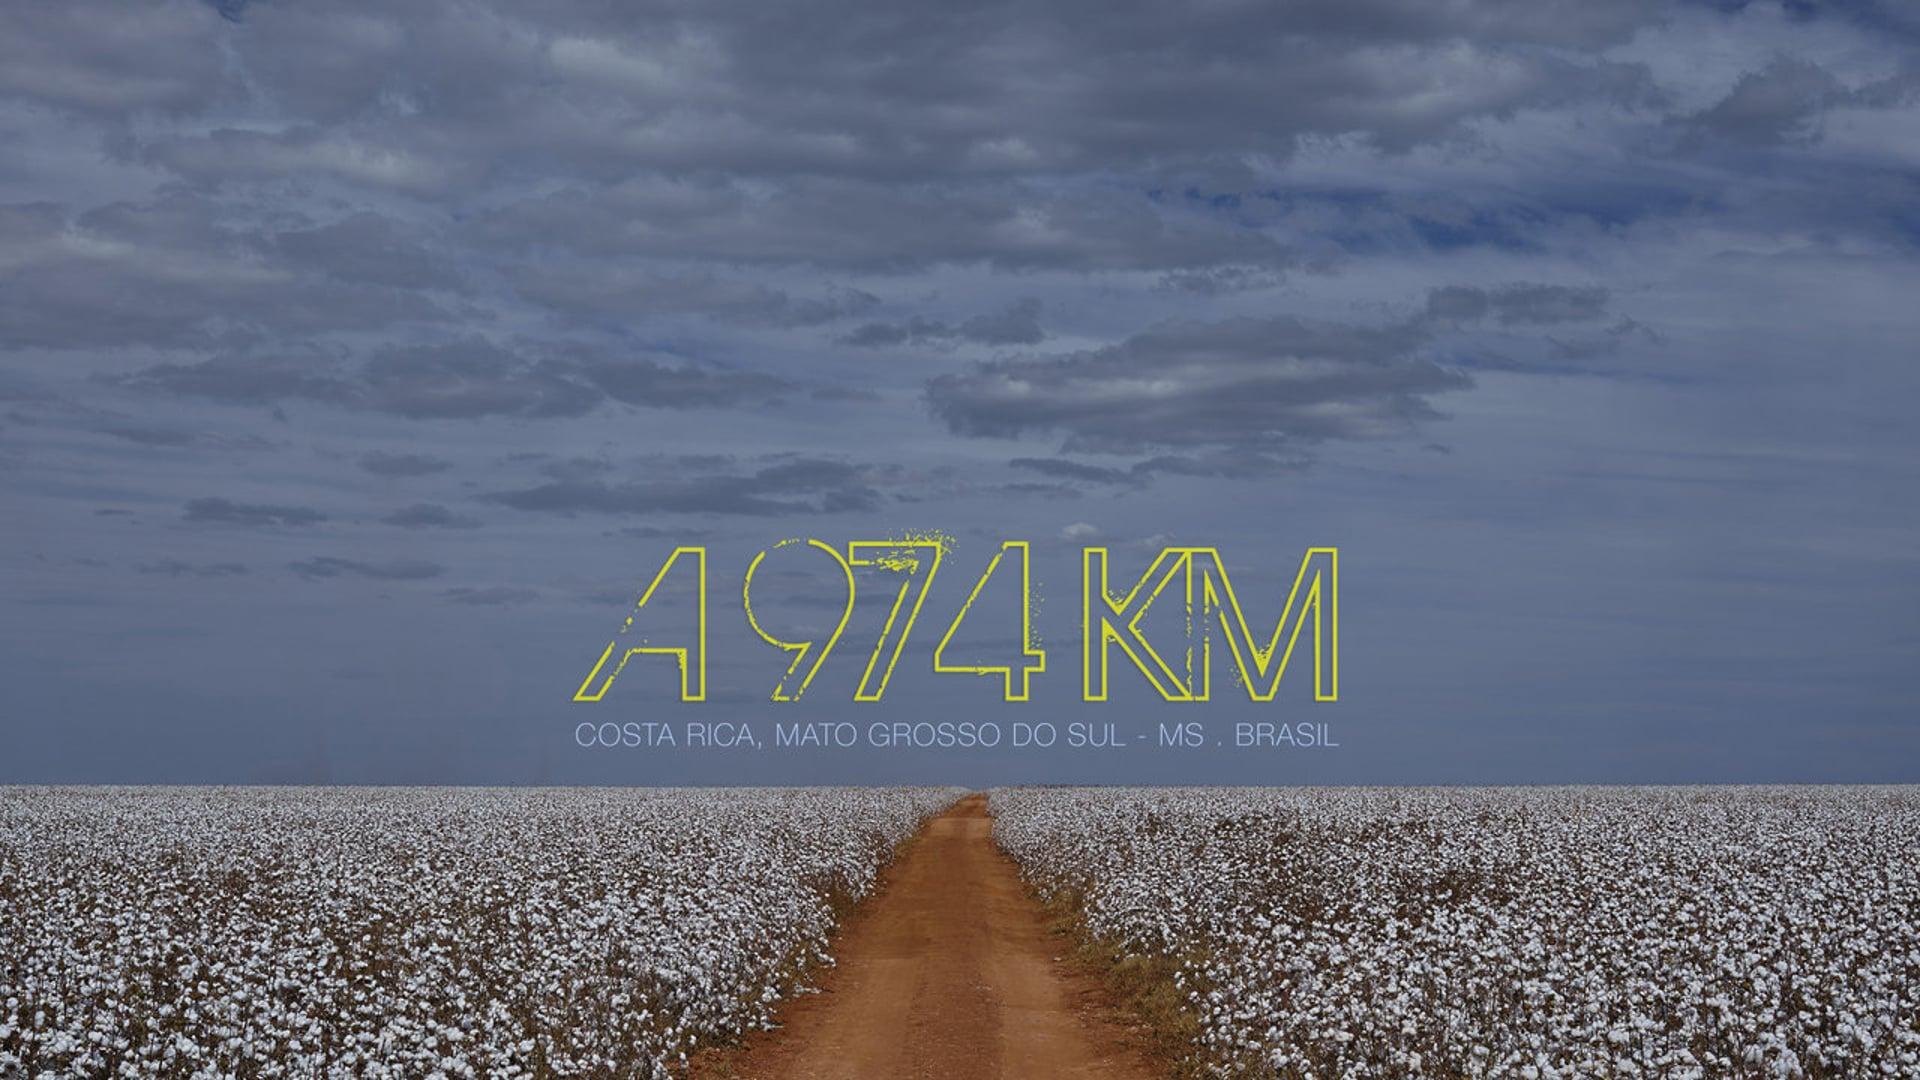 A 974 KM